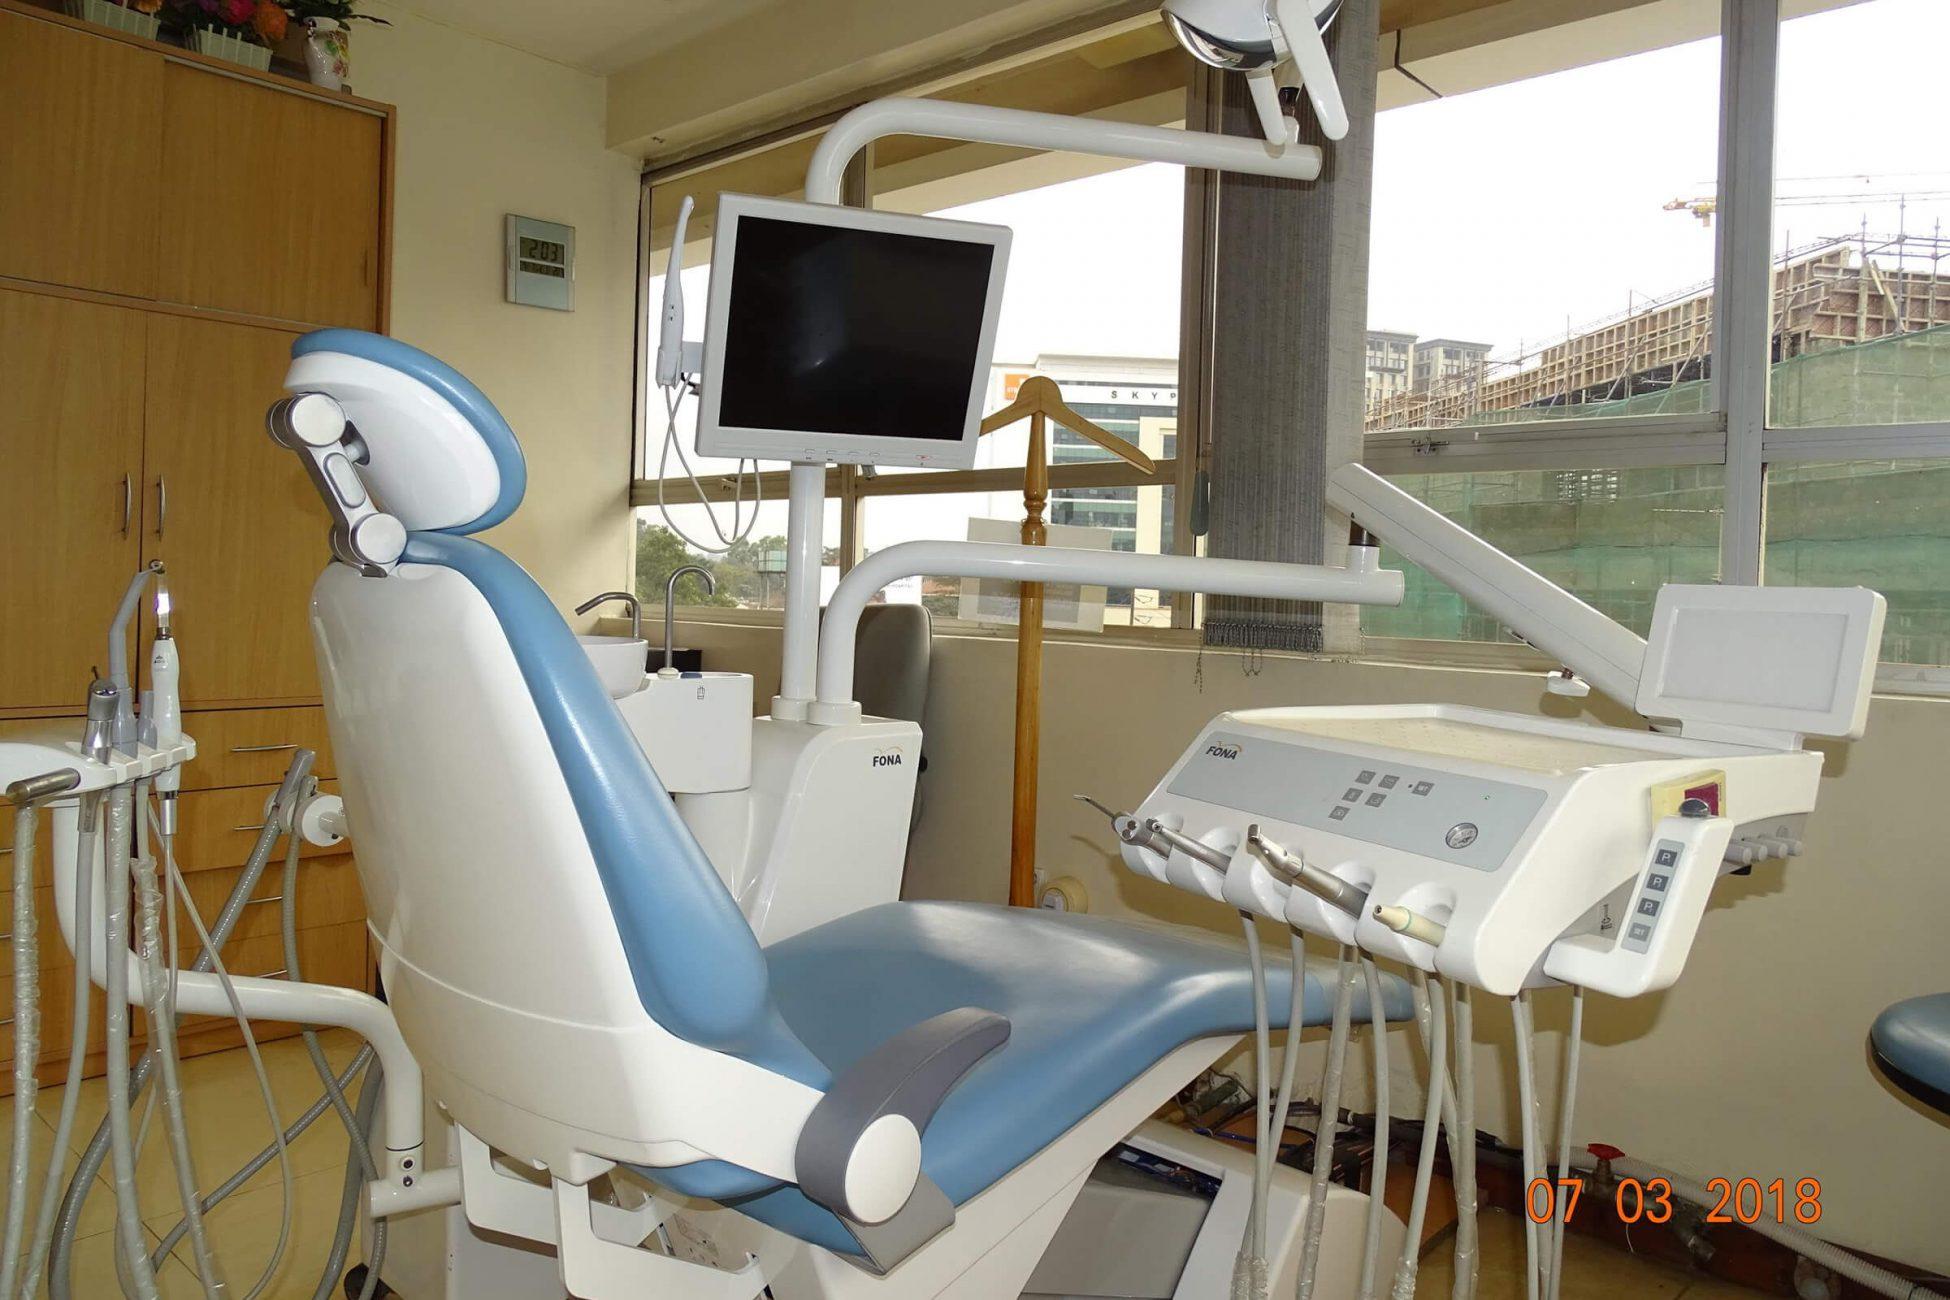 Blue Sky Dental Practice